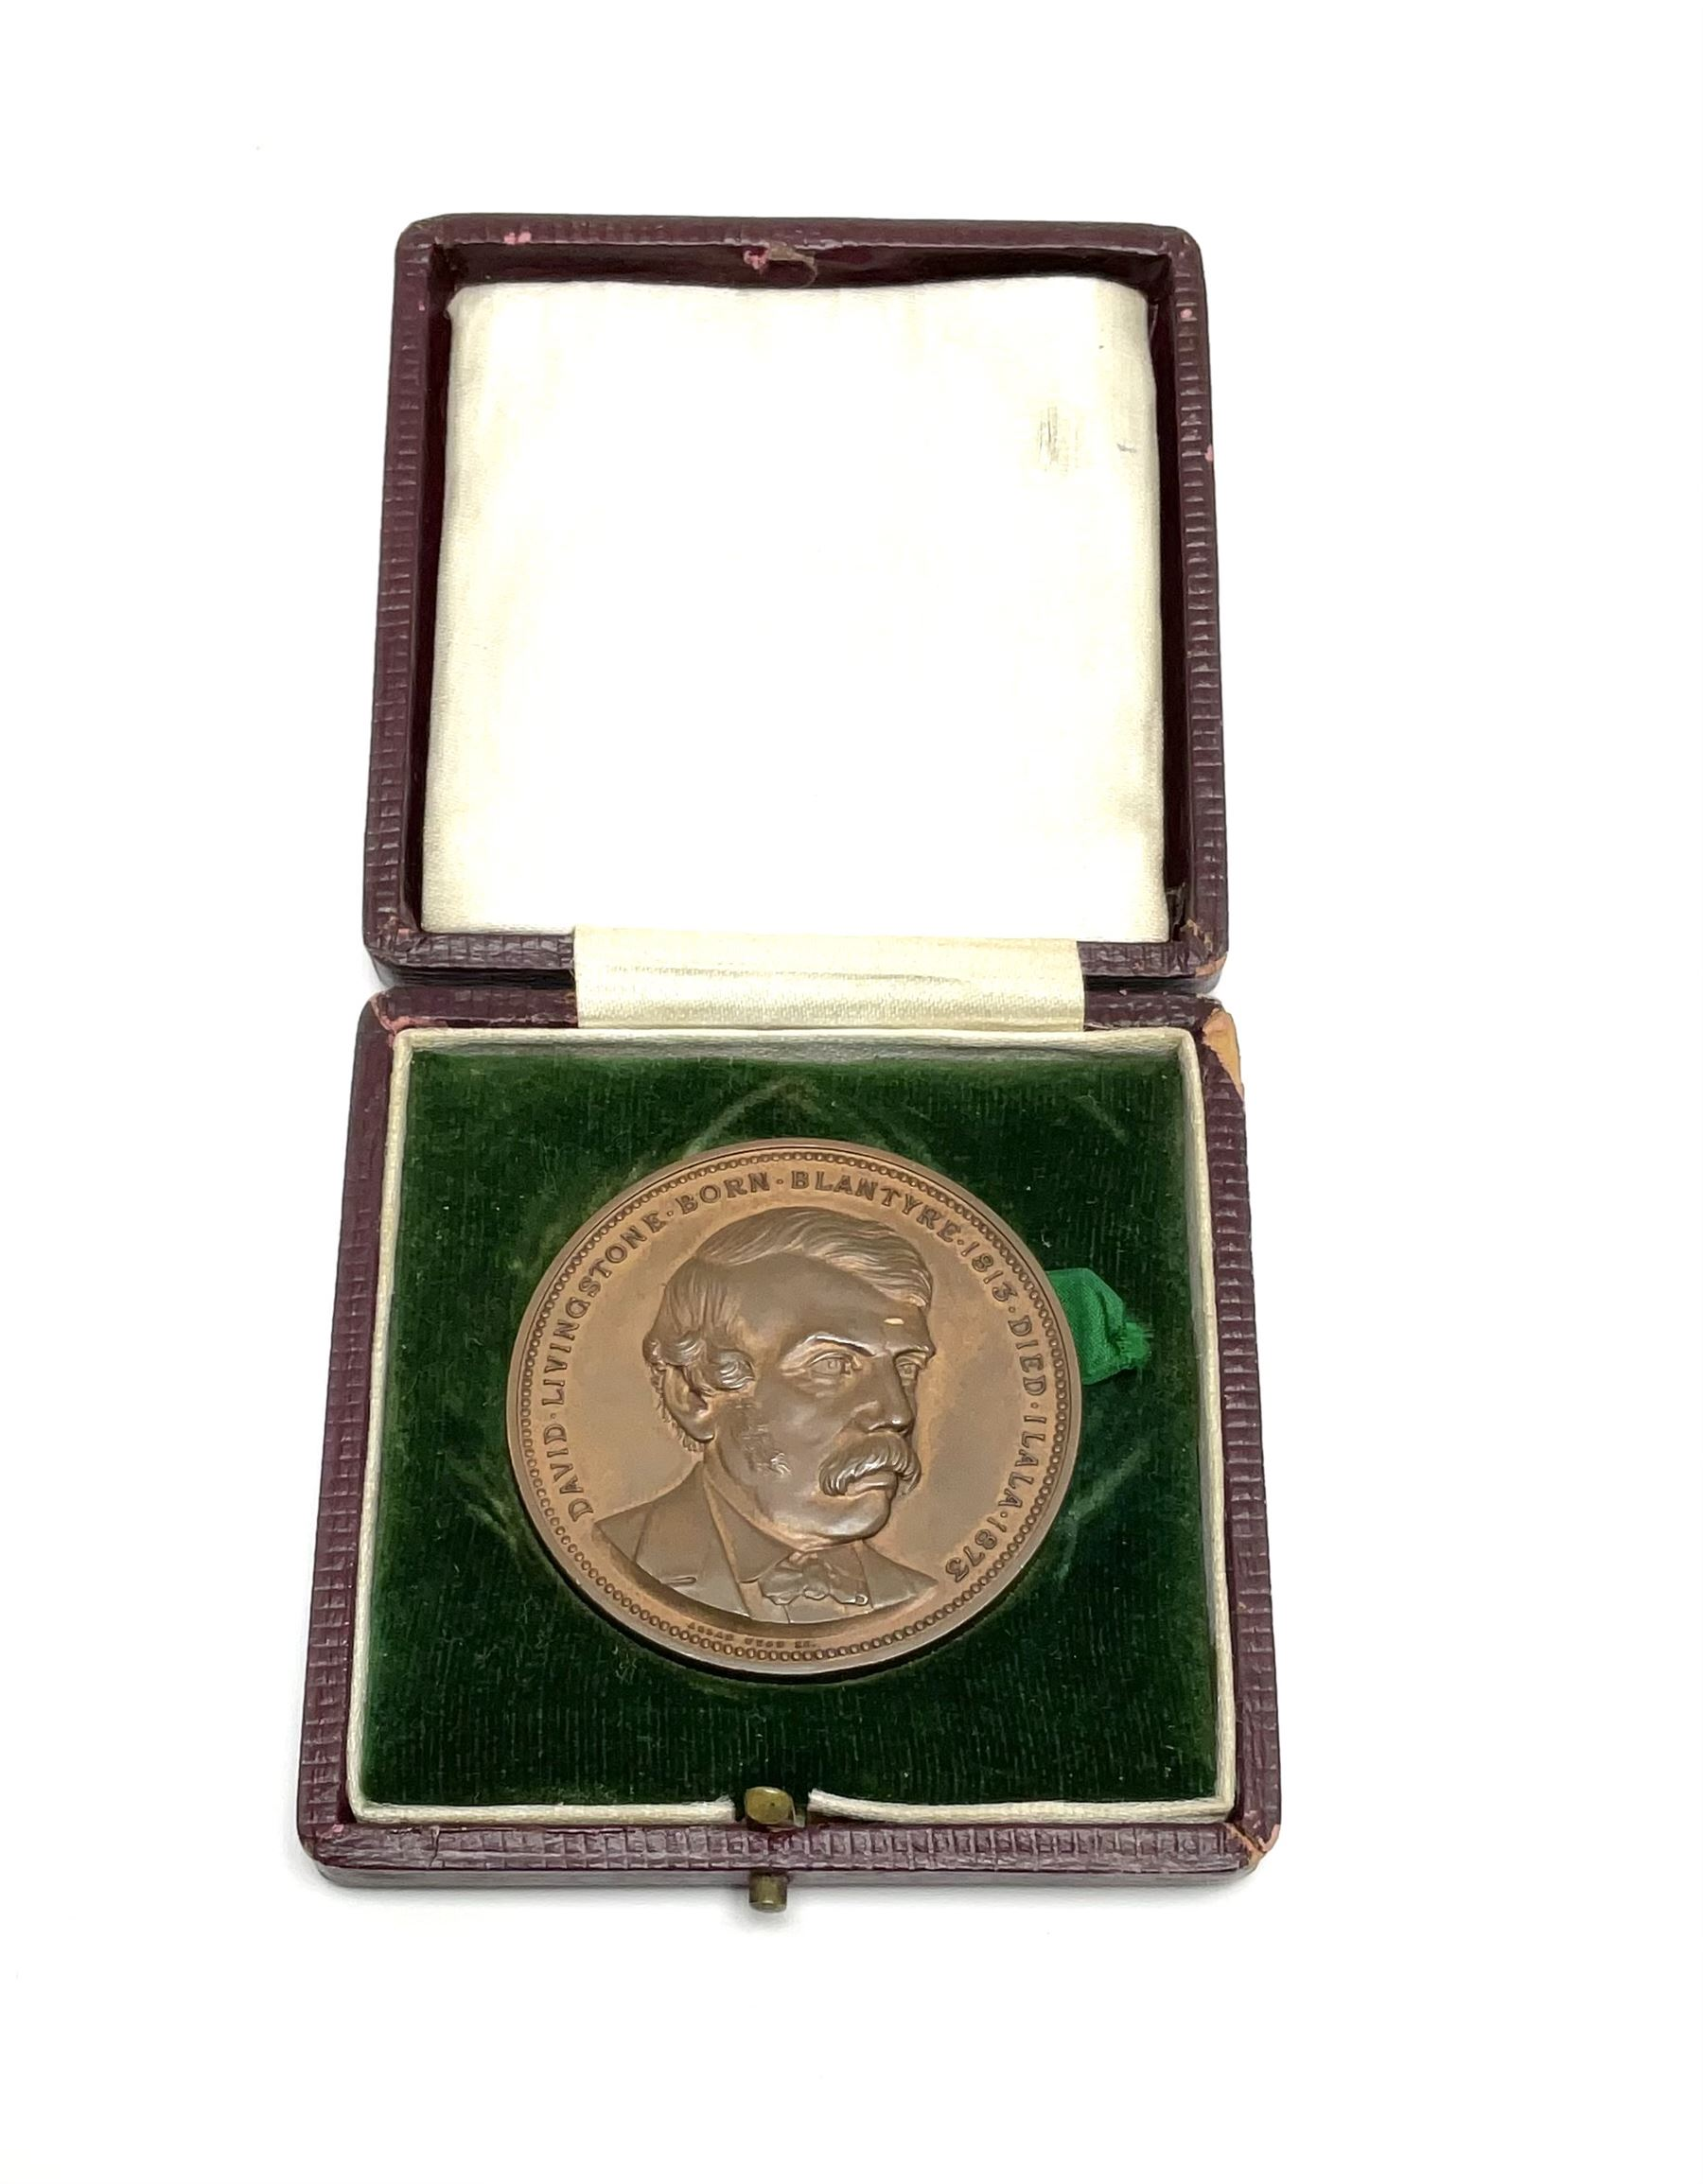 David Livingstone (1813-1873) commemorative medallion celebrating the Centenary of his birth